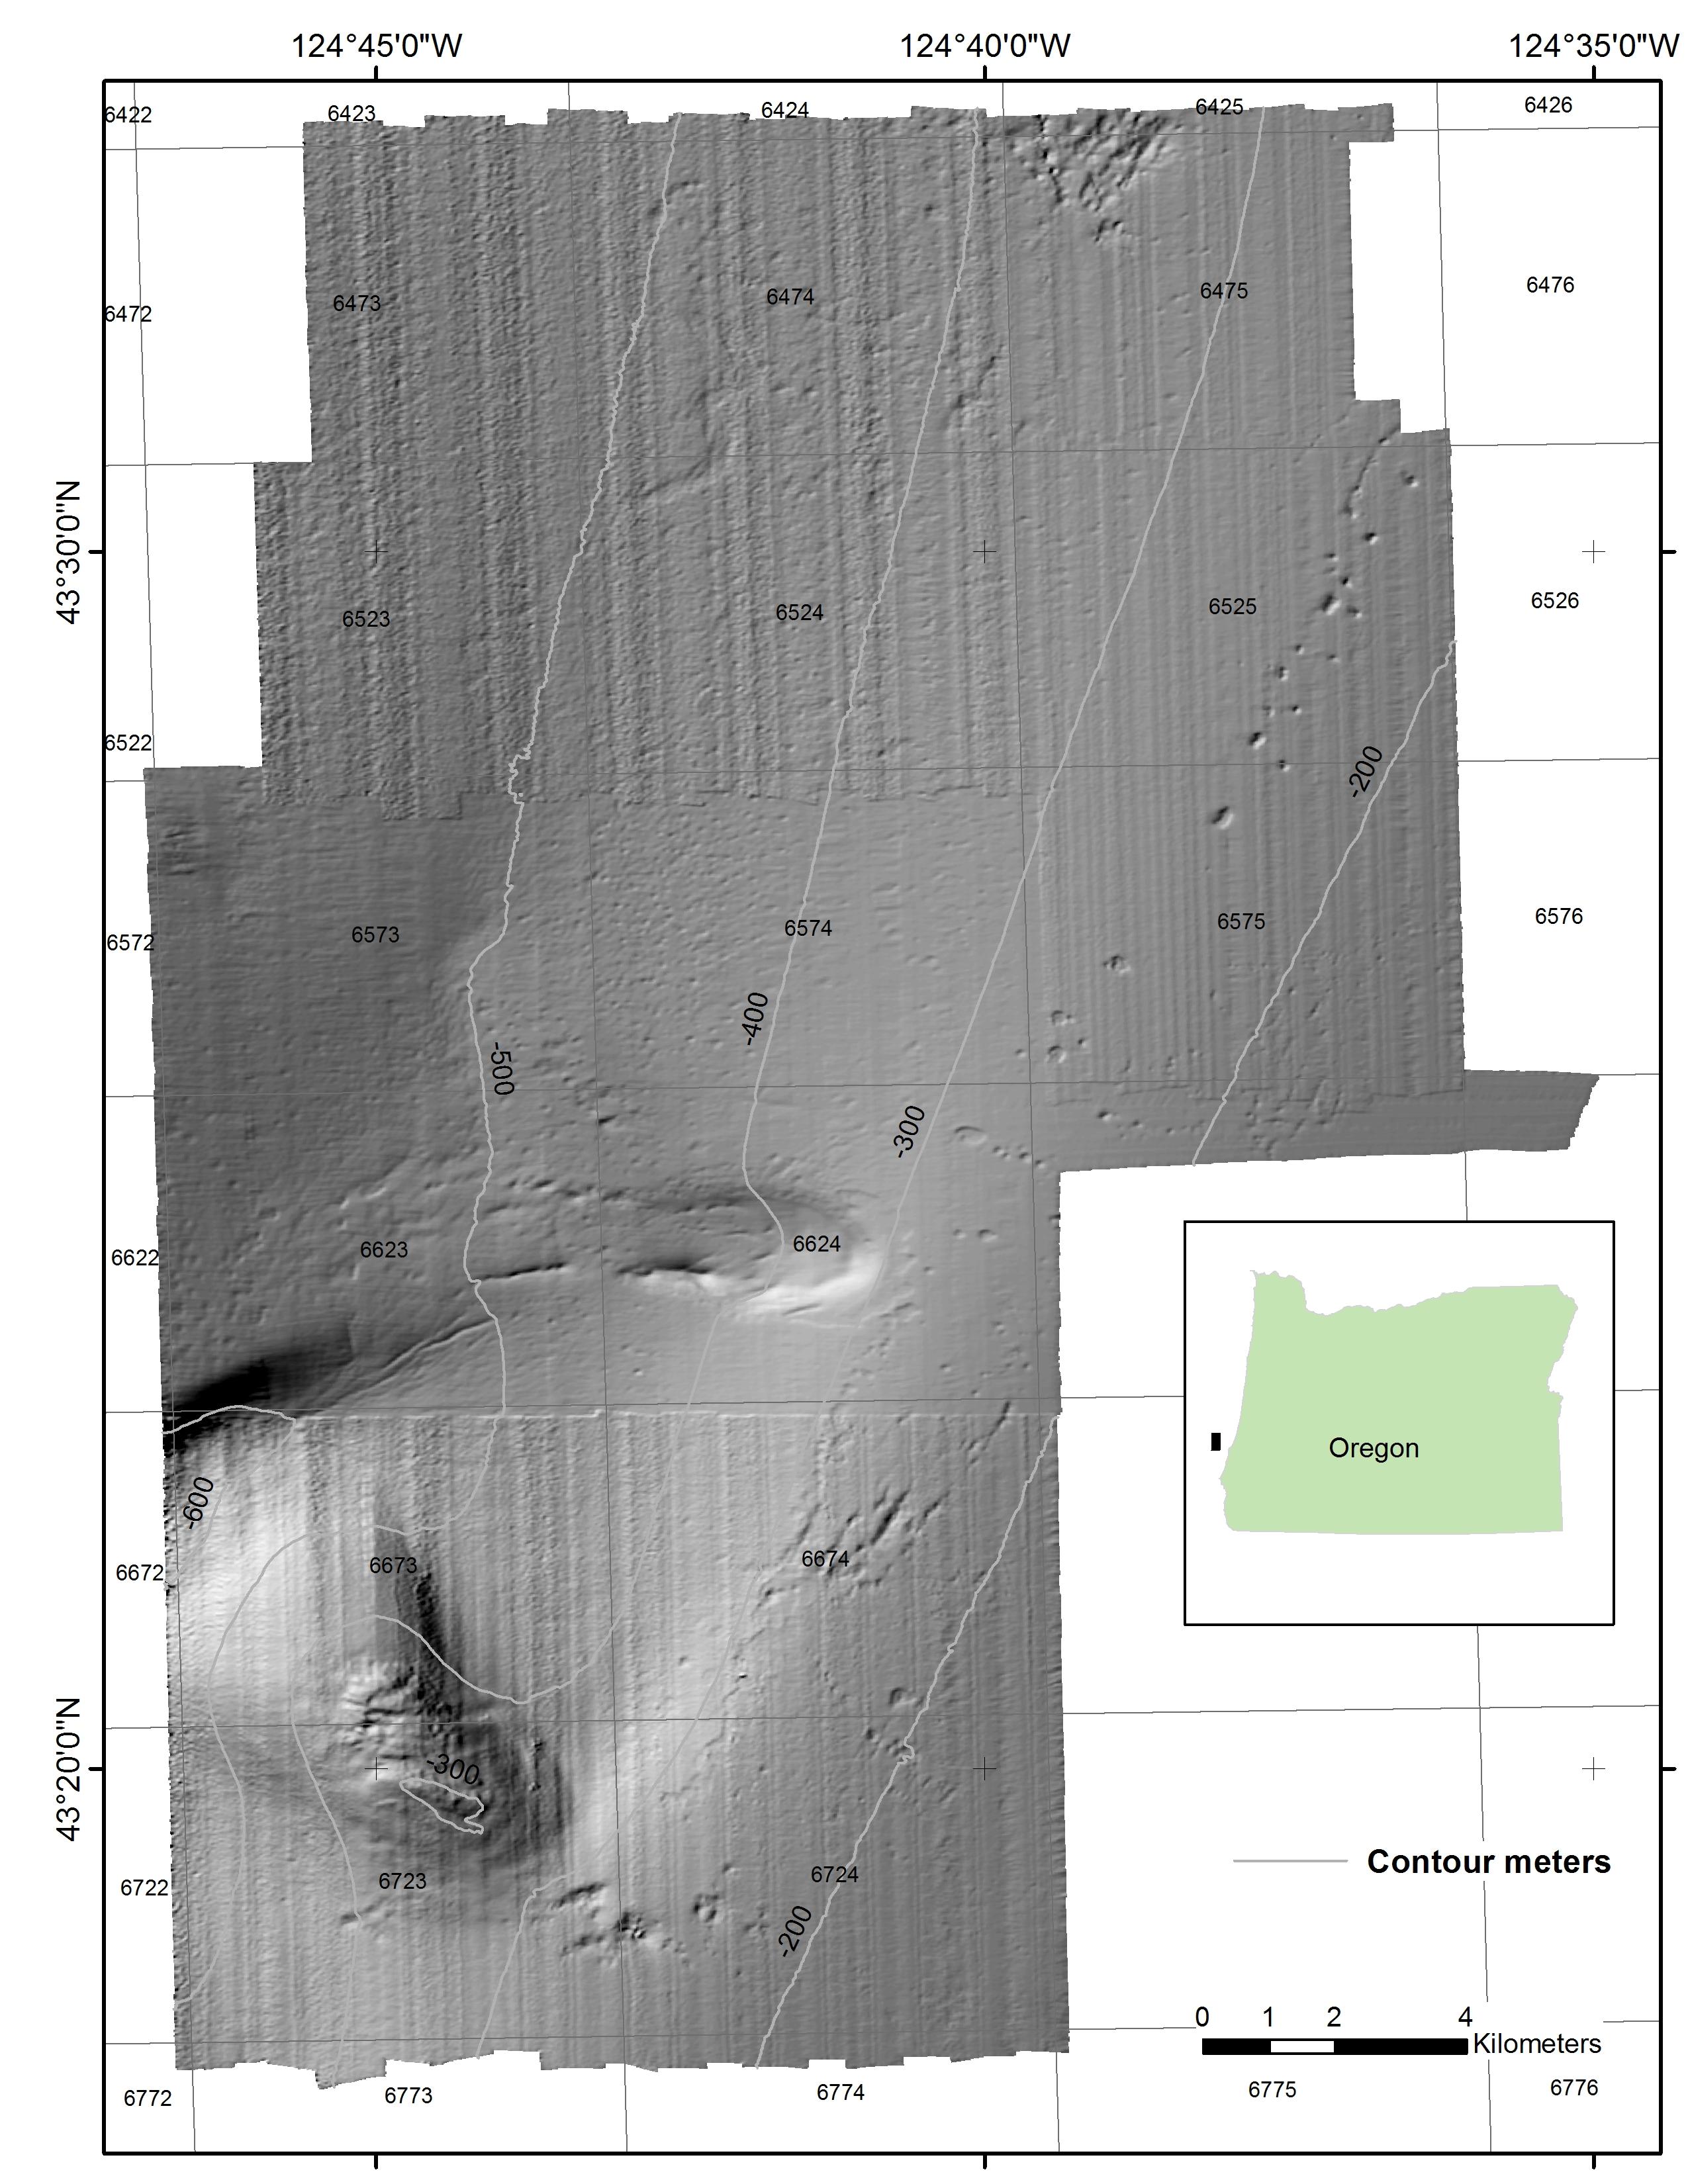 Bathymetry hillshade map Oregon OCS Floating Wind Farm Site.